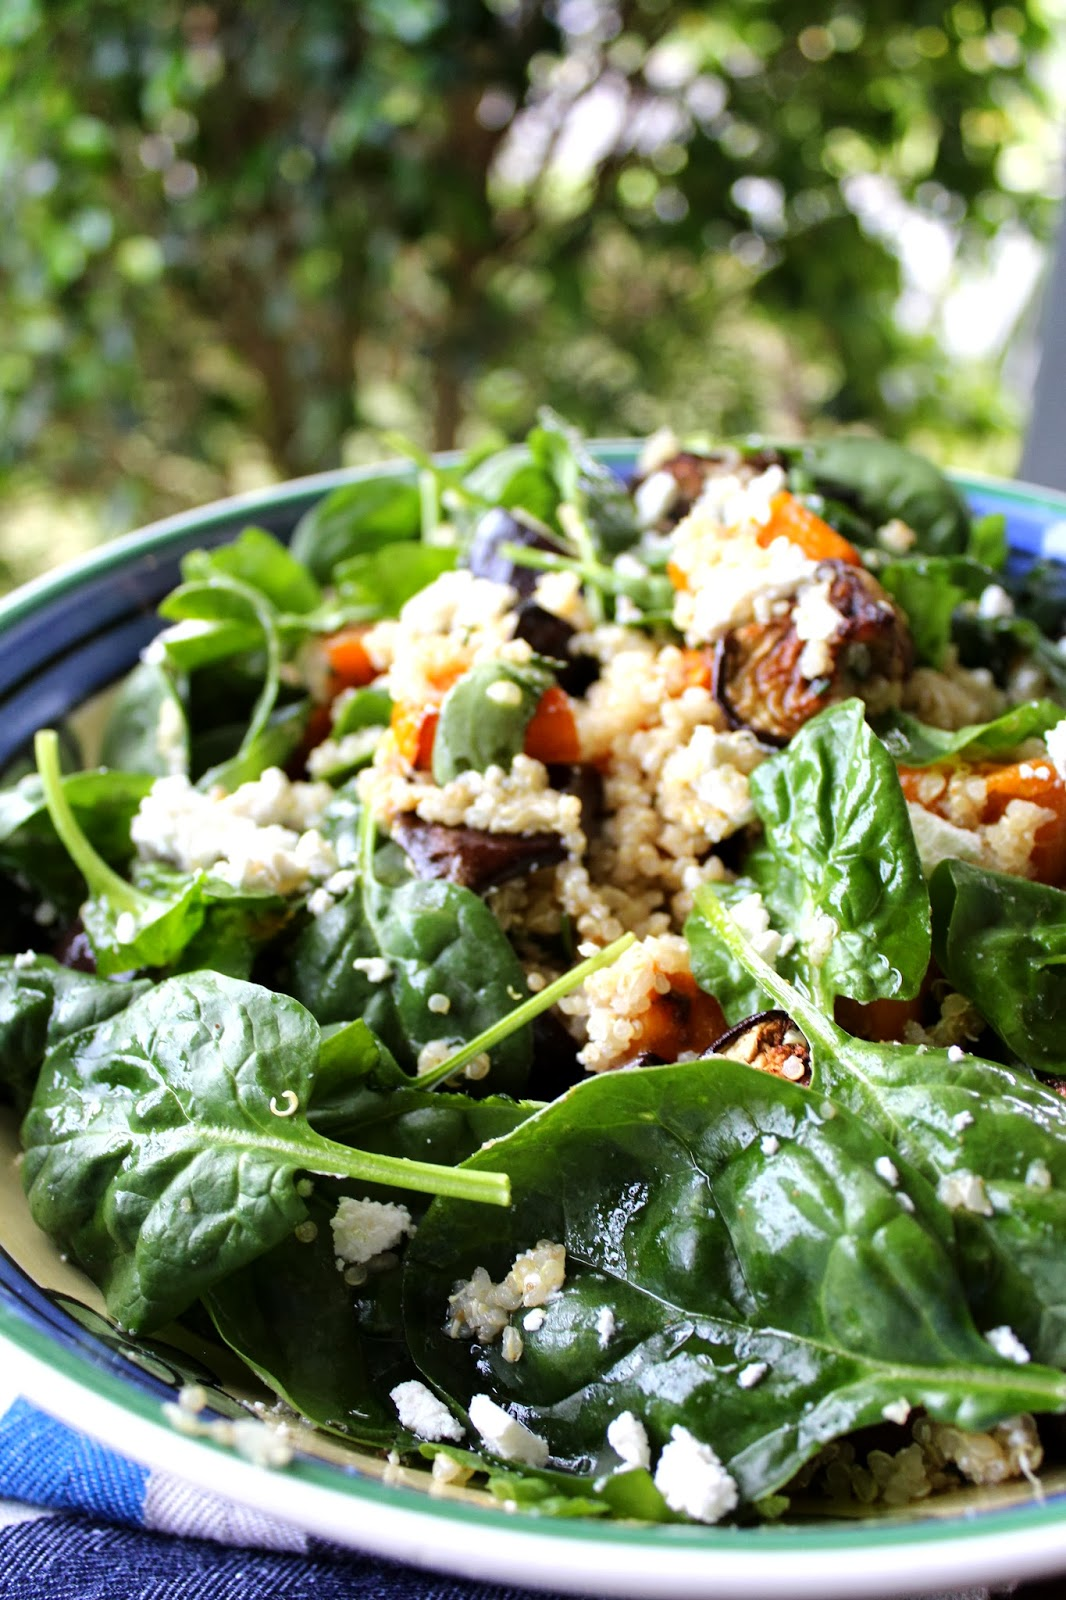 Roasted Sweet Potato And Feta Salad Recipes — Dishmaps